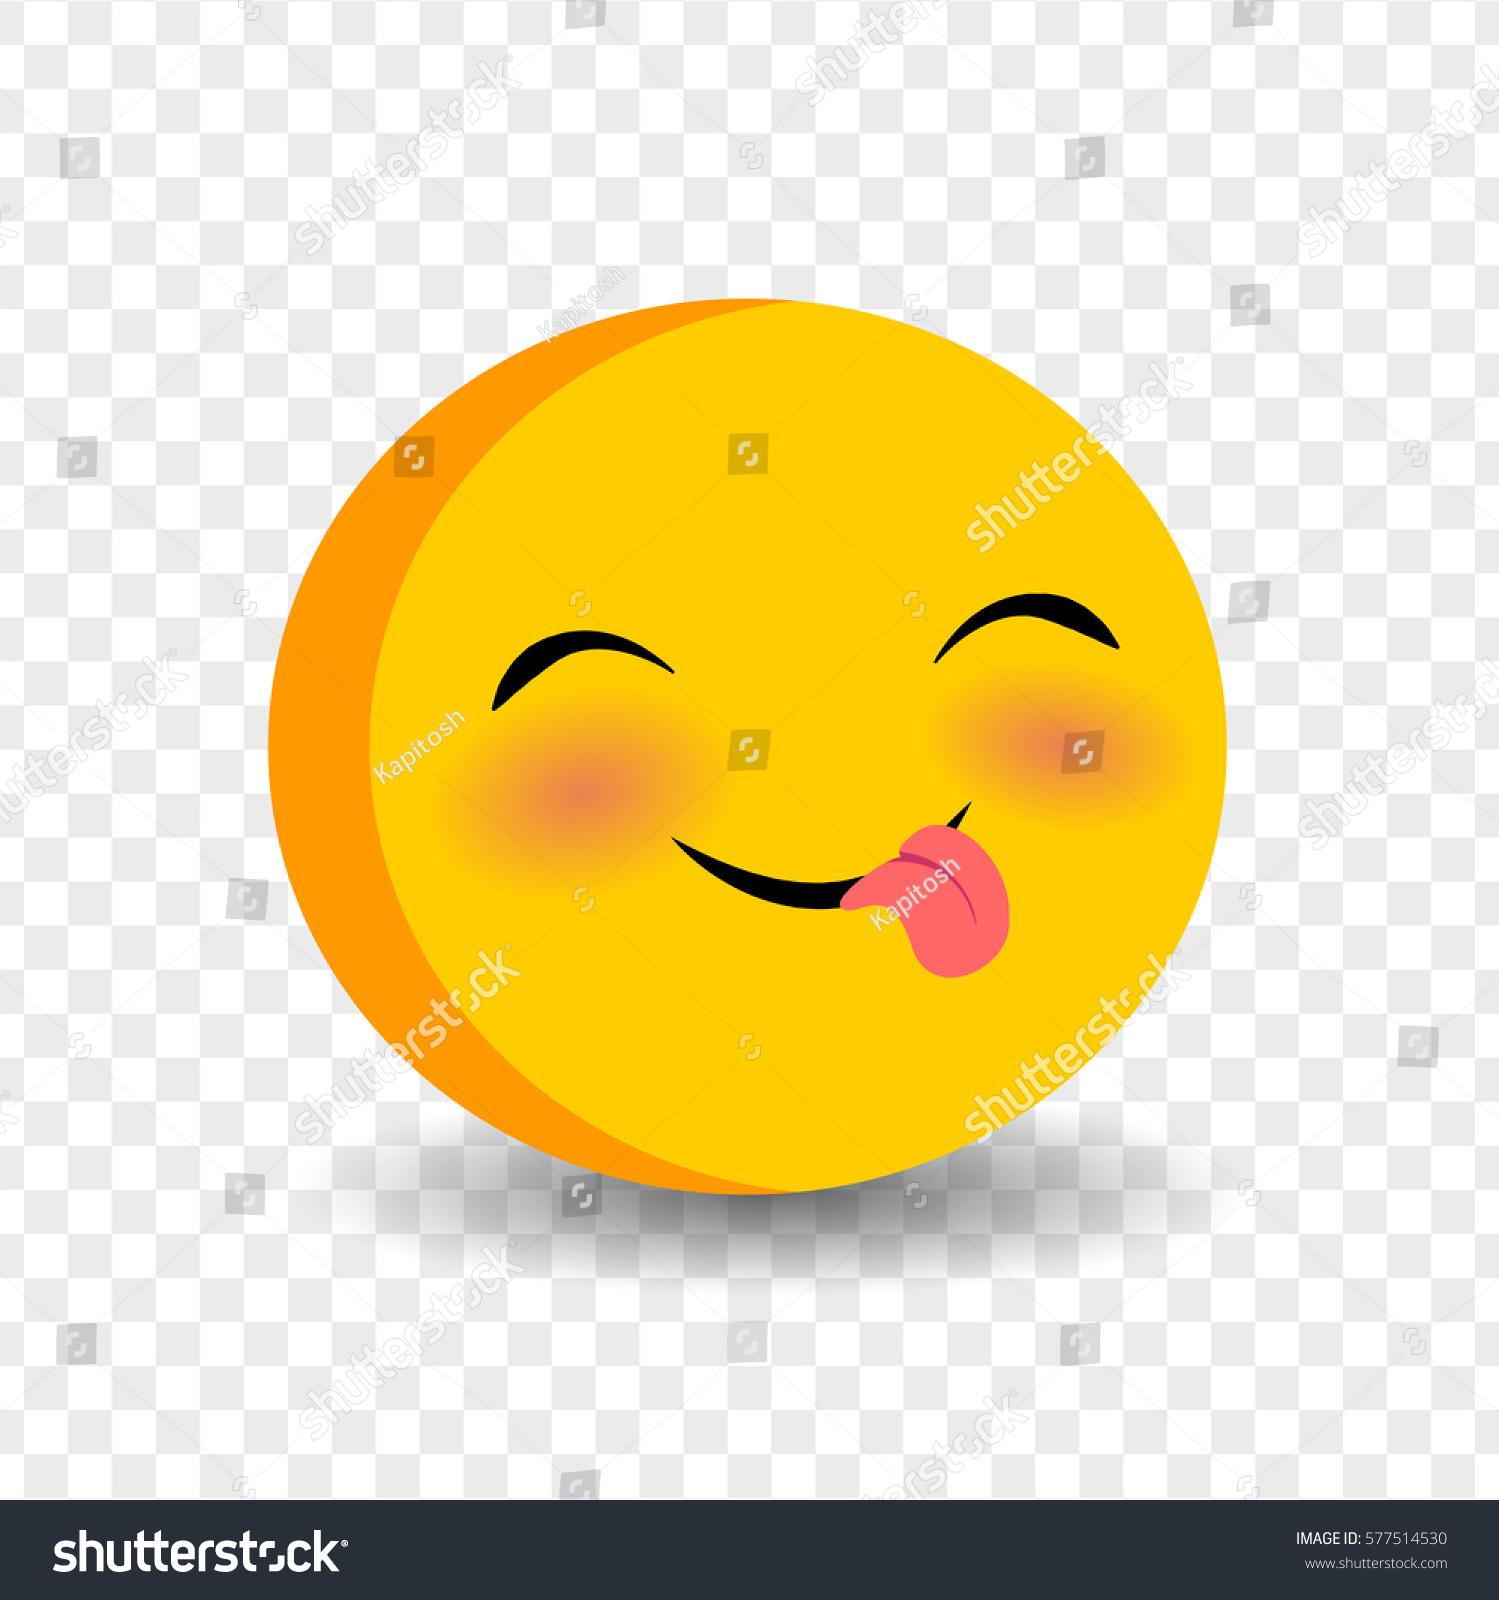 Fun playful cute facial